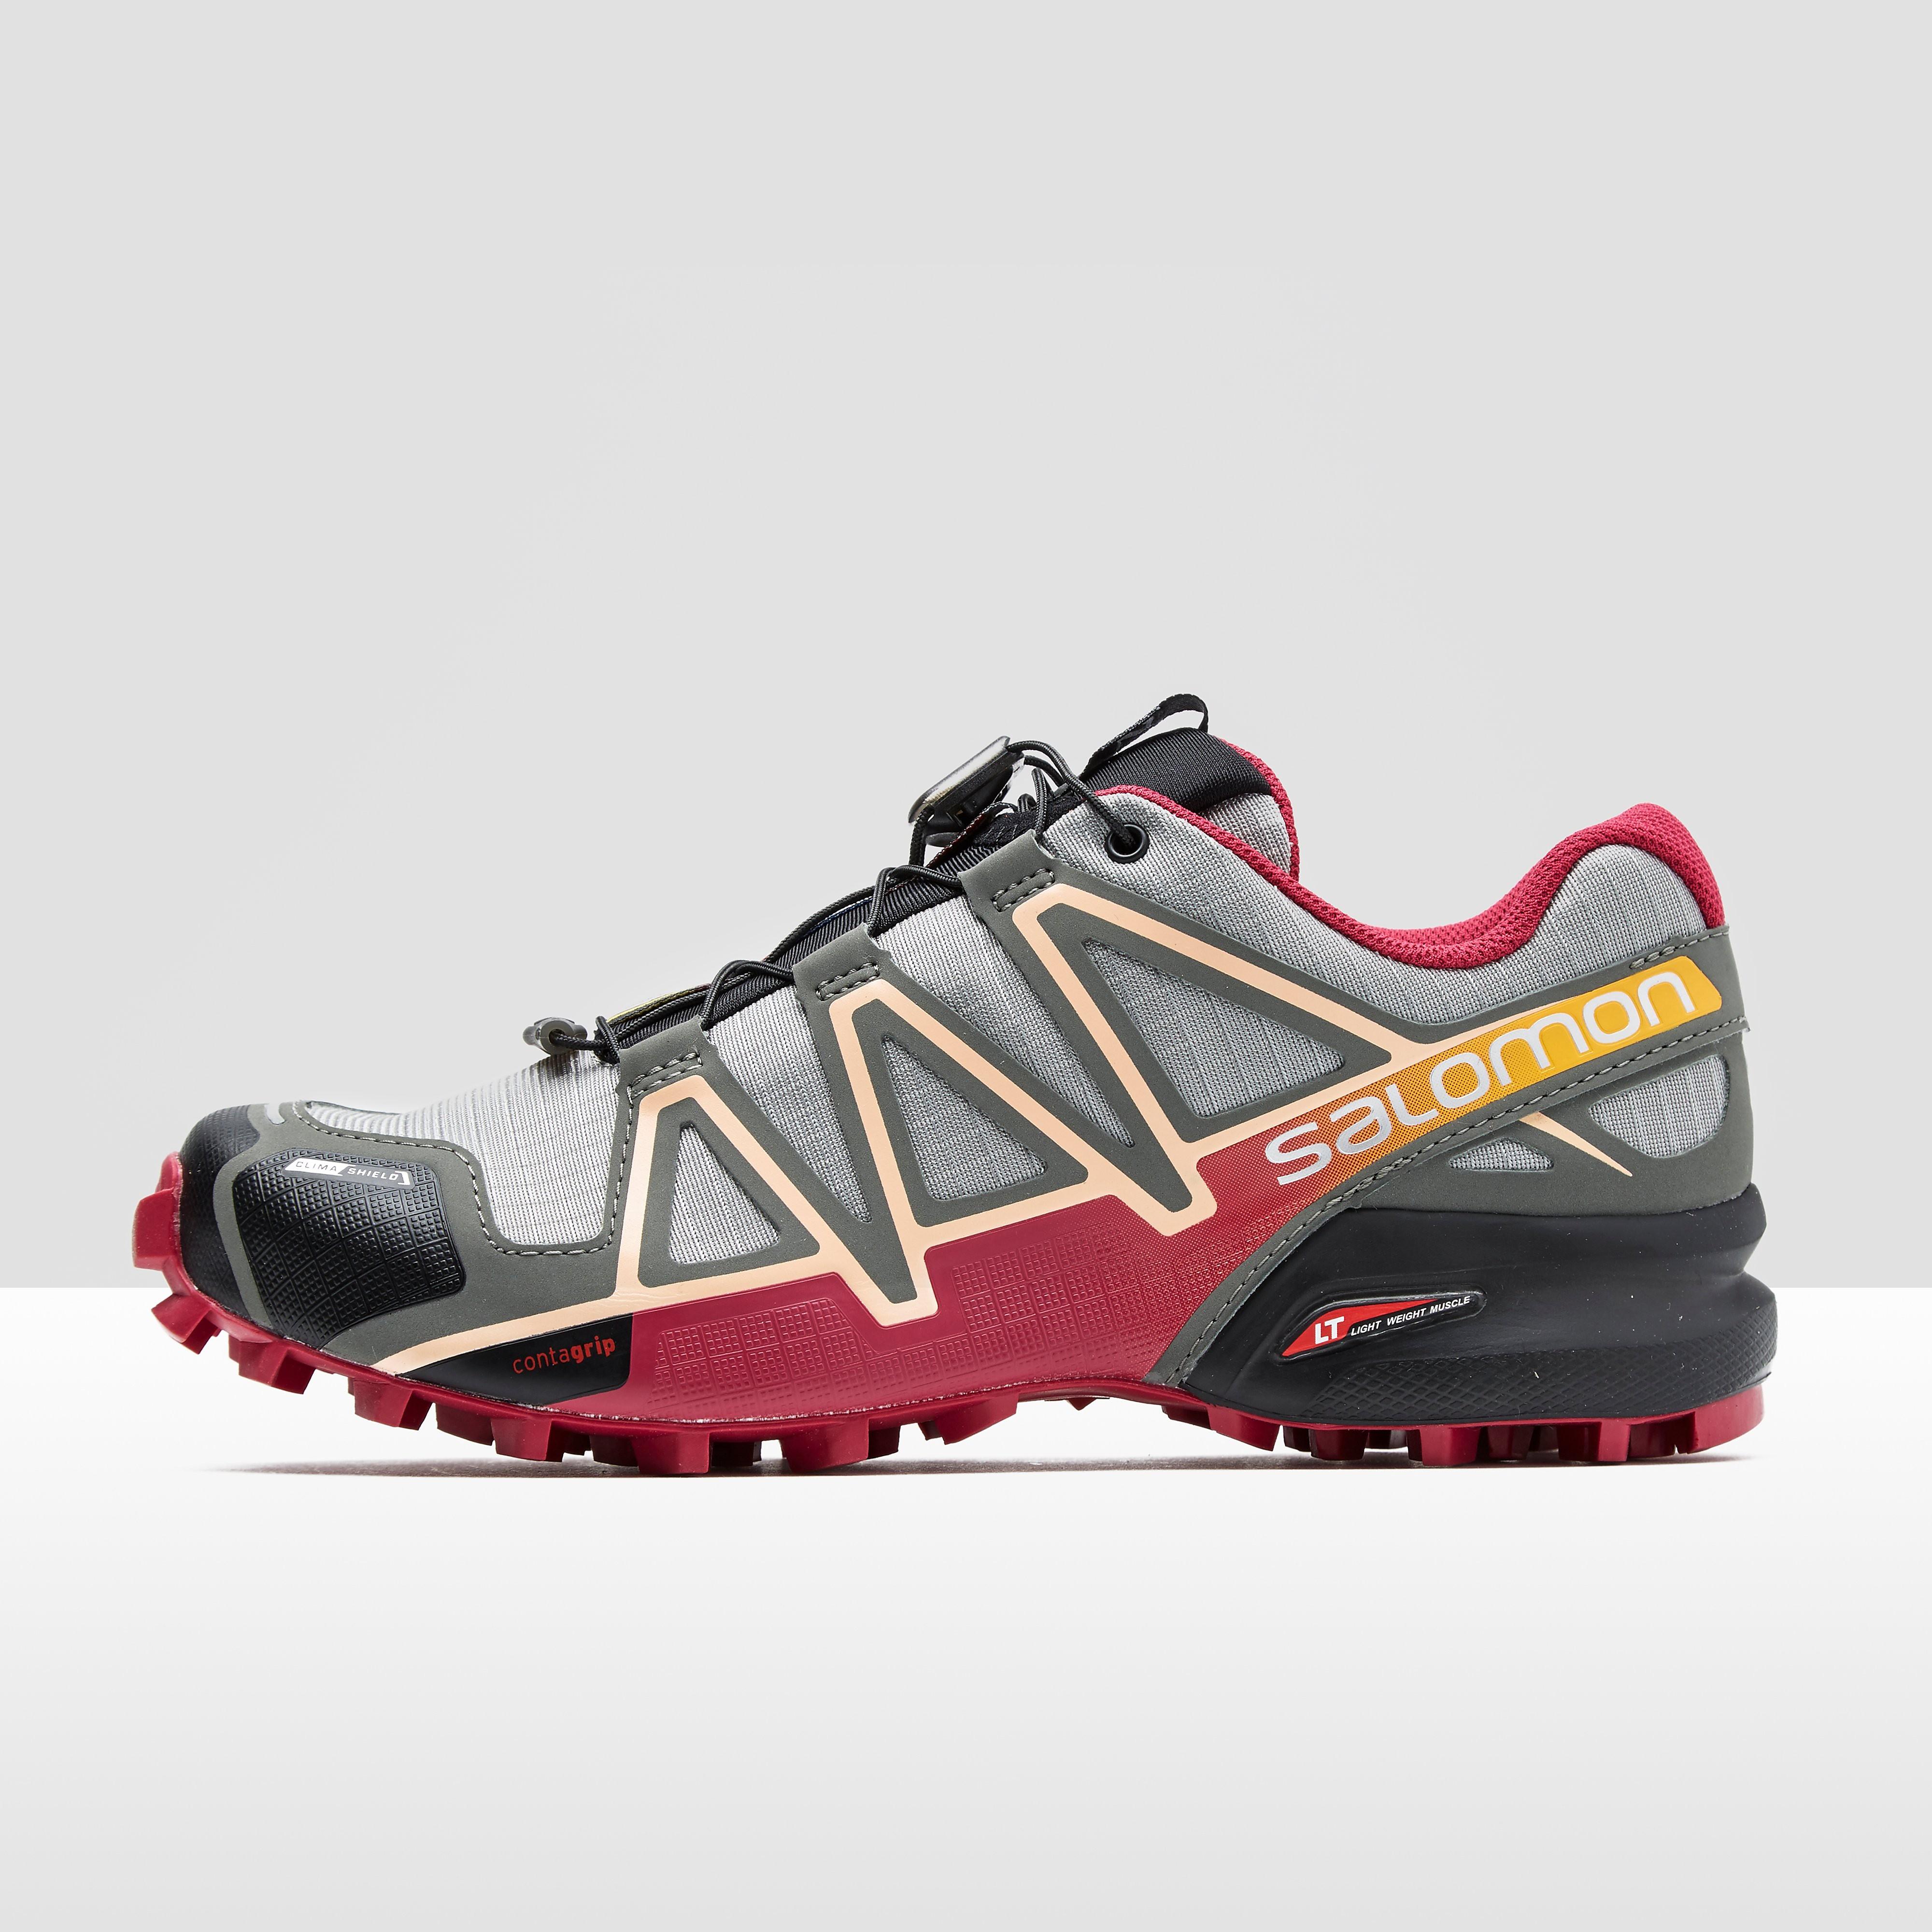 Salomon Speedcross 4 CS Women's Trail Running Shoes